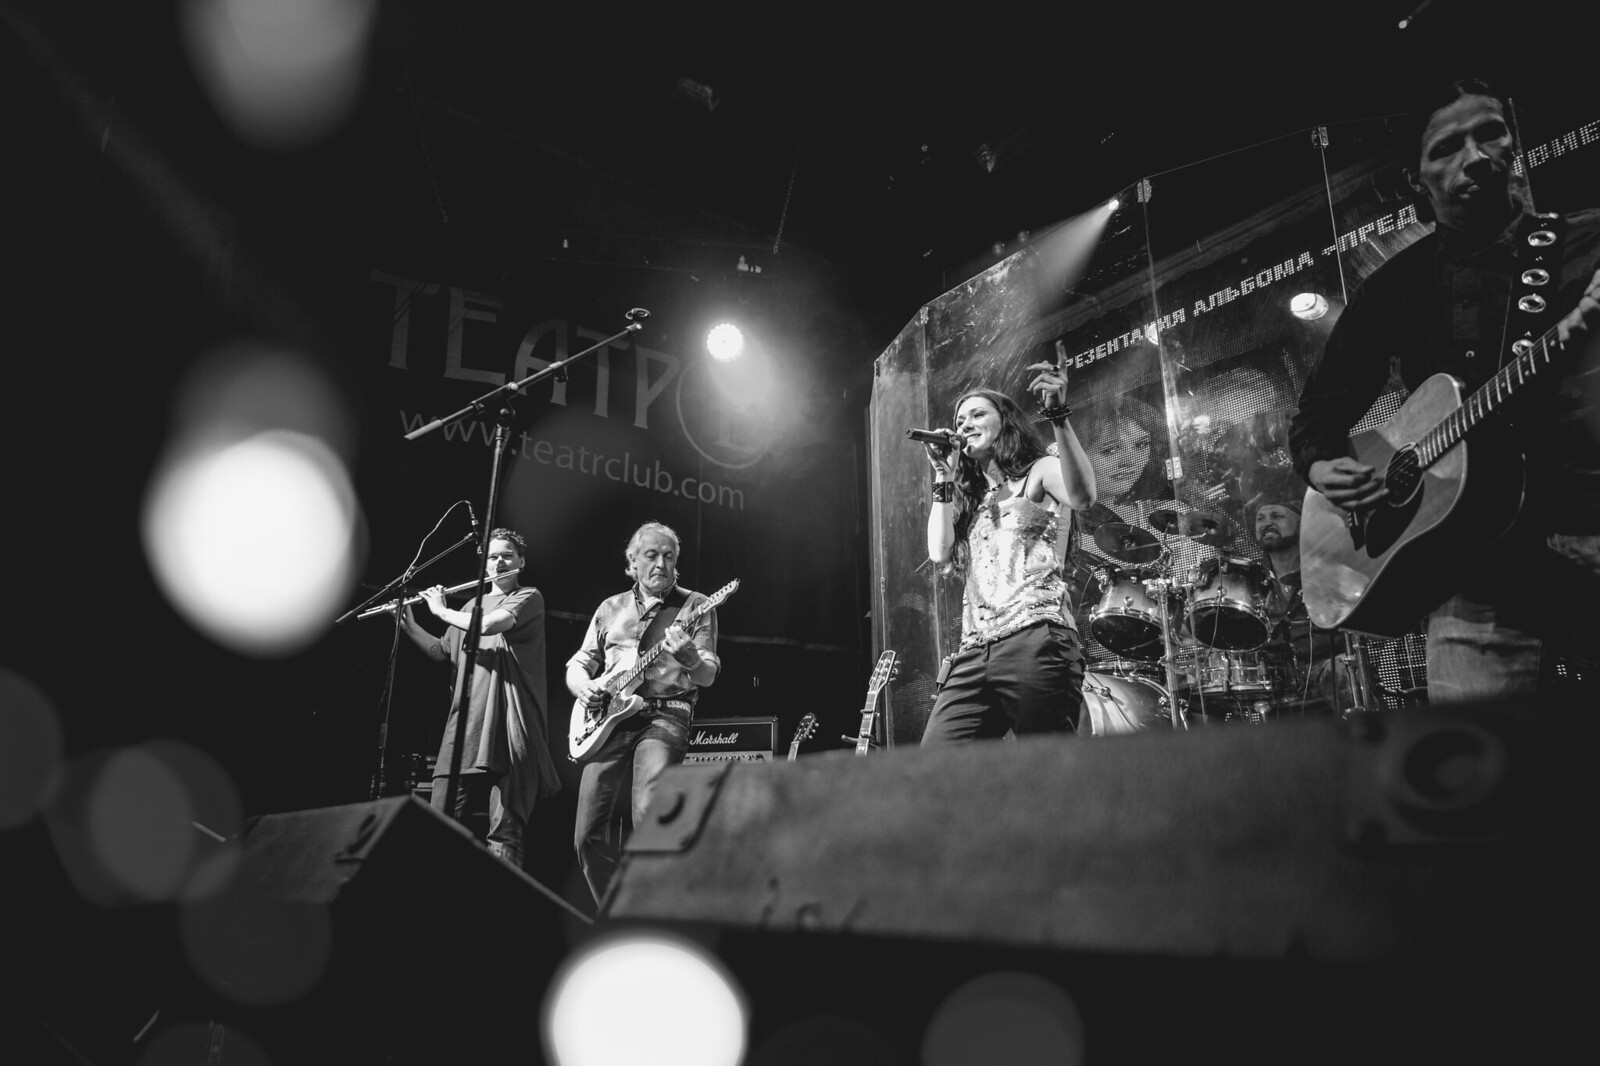 Группа Северо-Восток в клубе ТеатрЪ